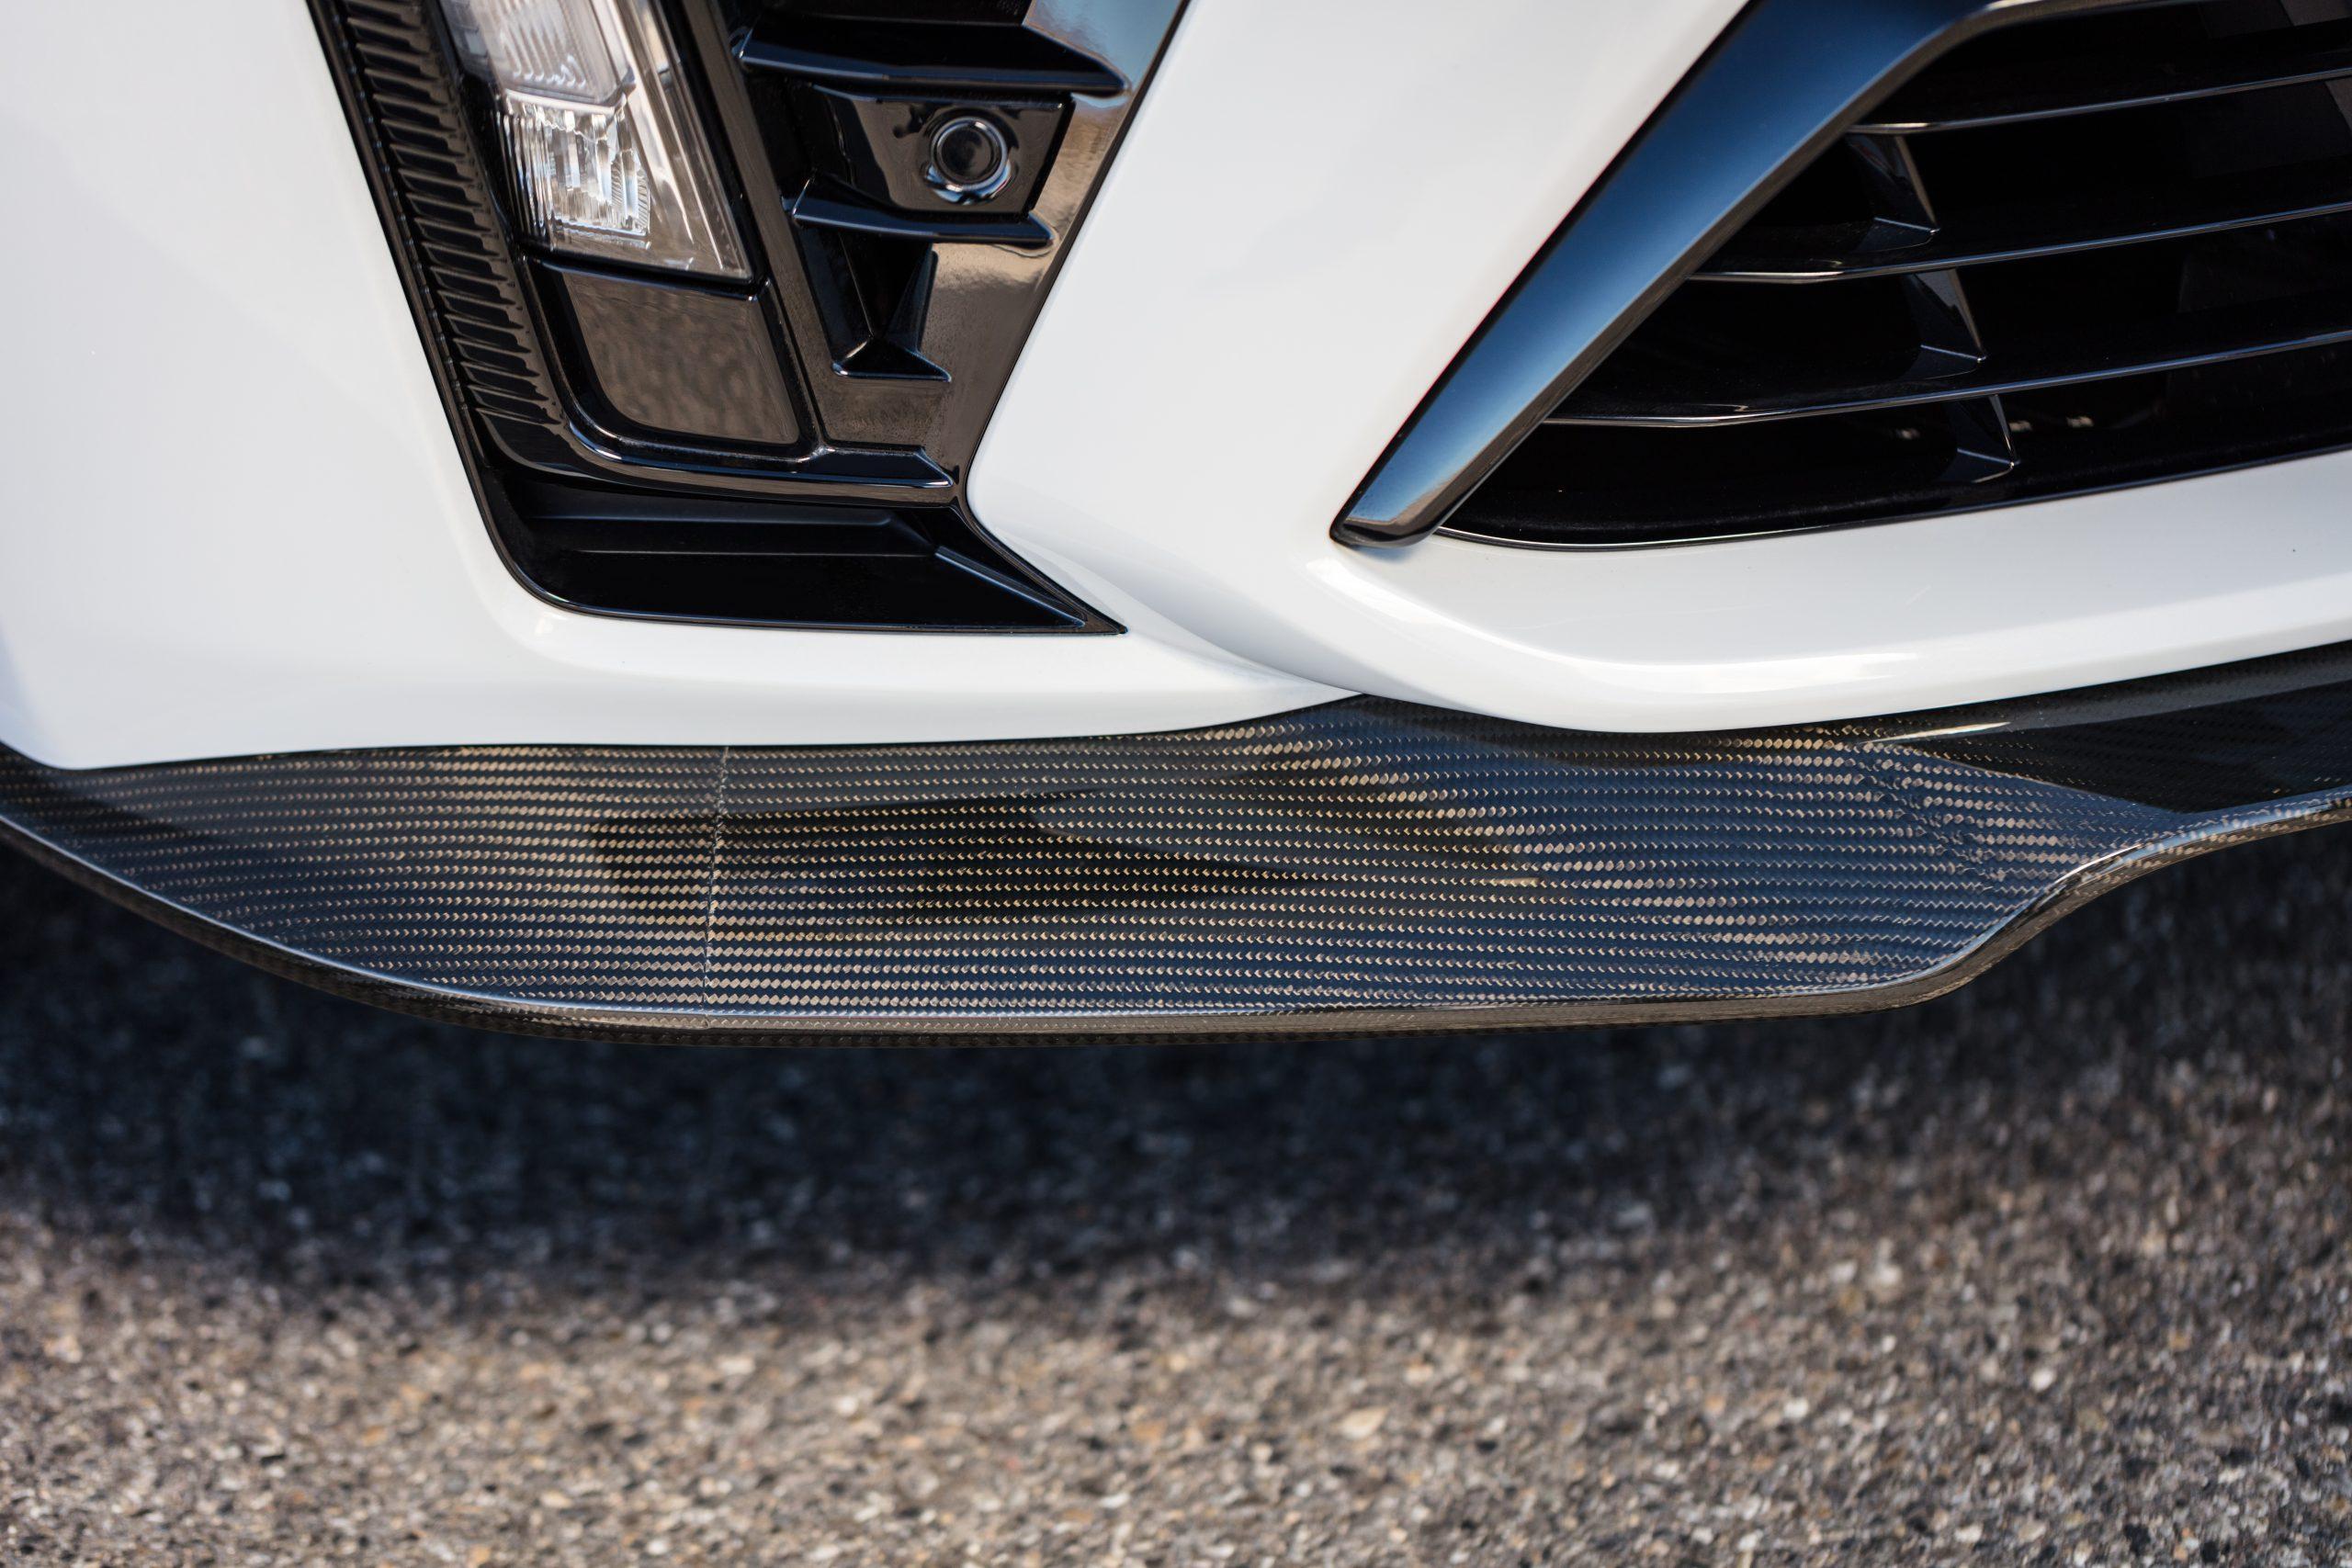 2022 Cadillac CT5-V Blackwing front splitter